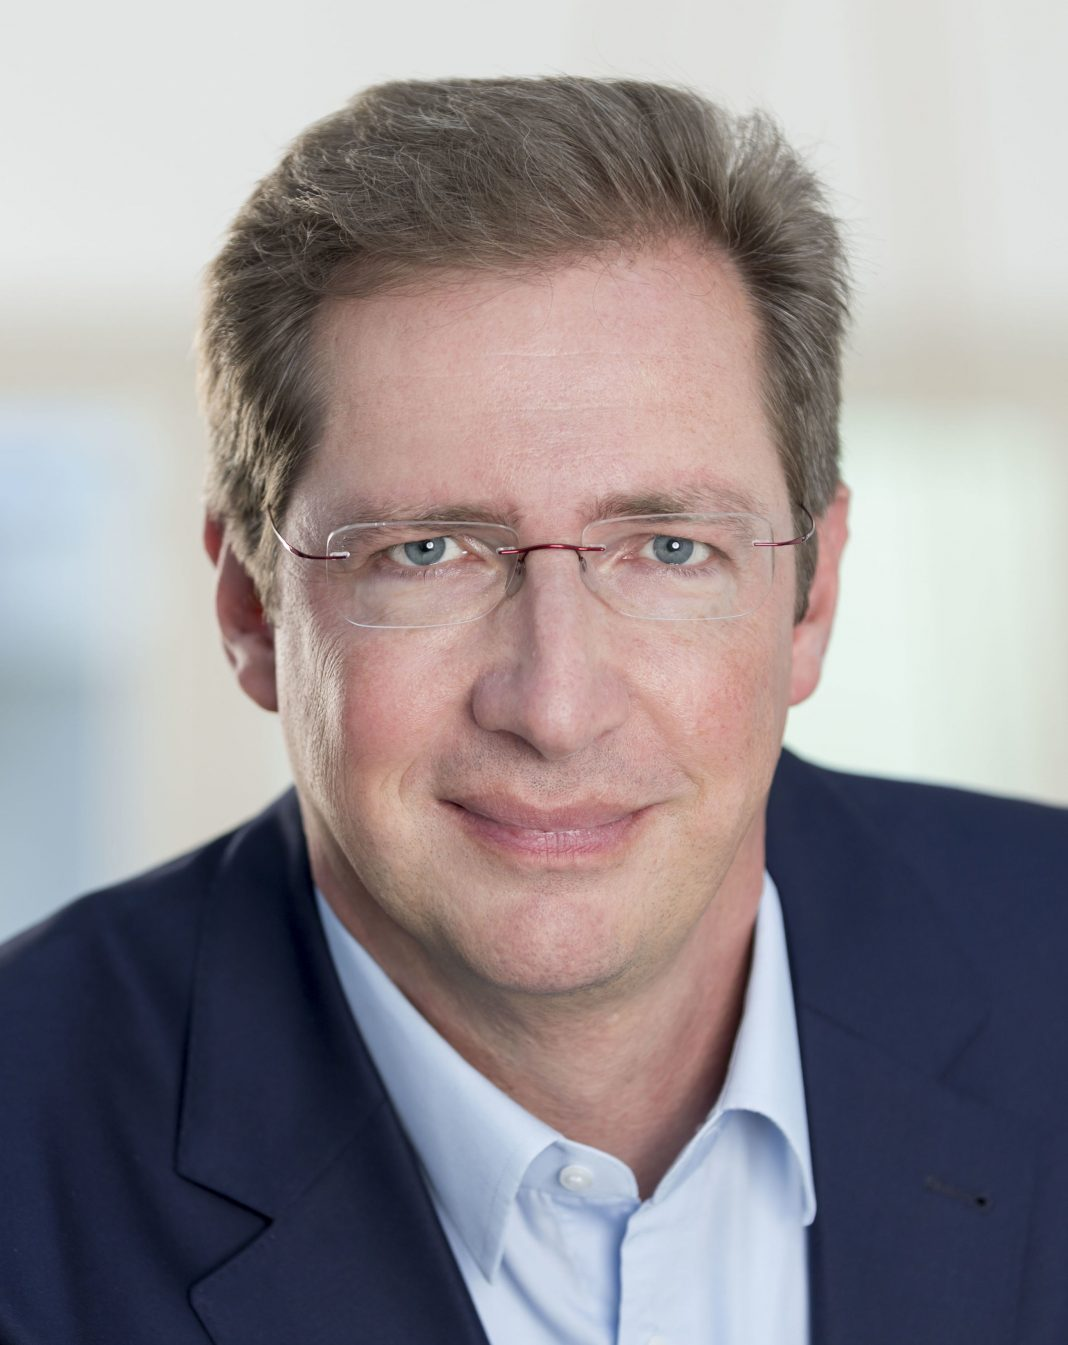 Klaus J. Rudolph, Swoboda Technologies